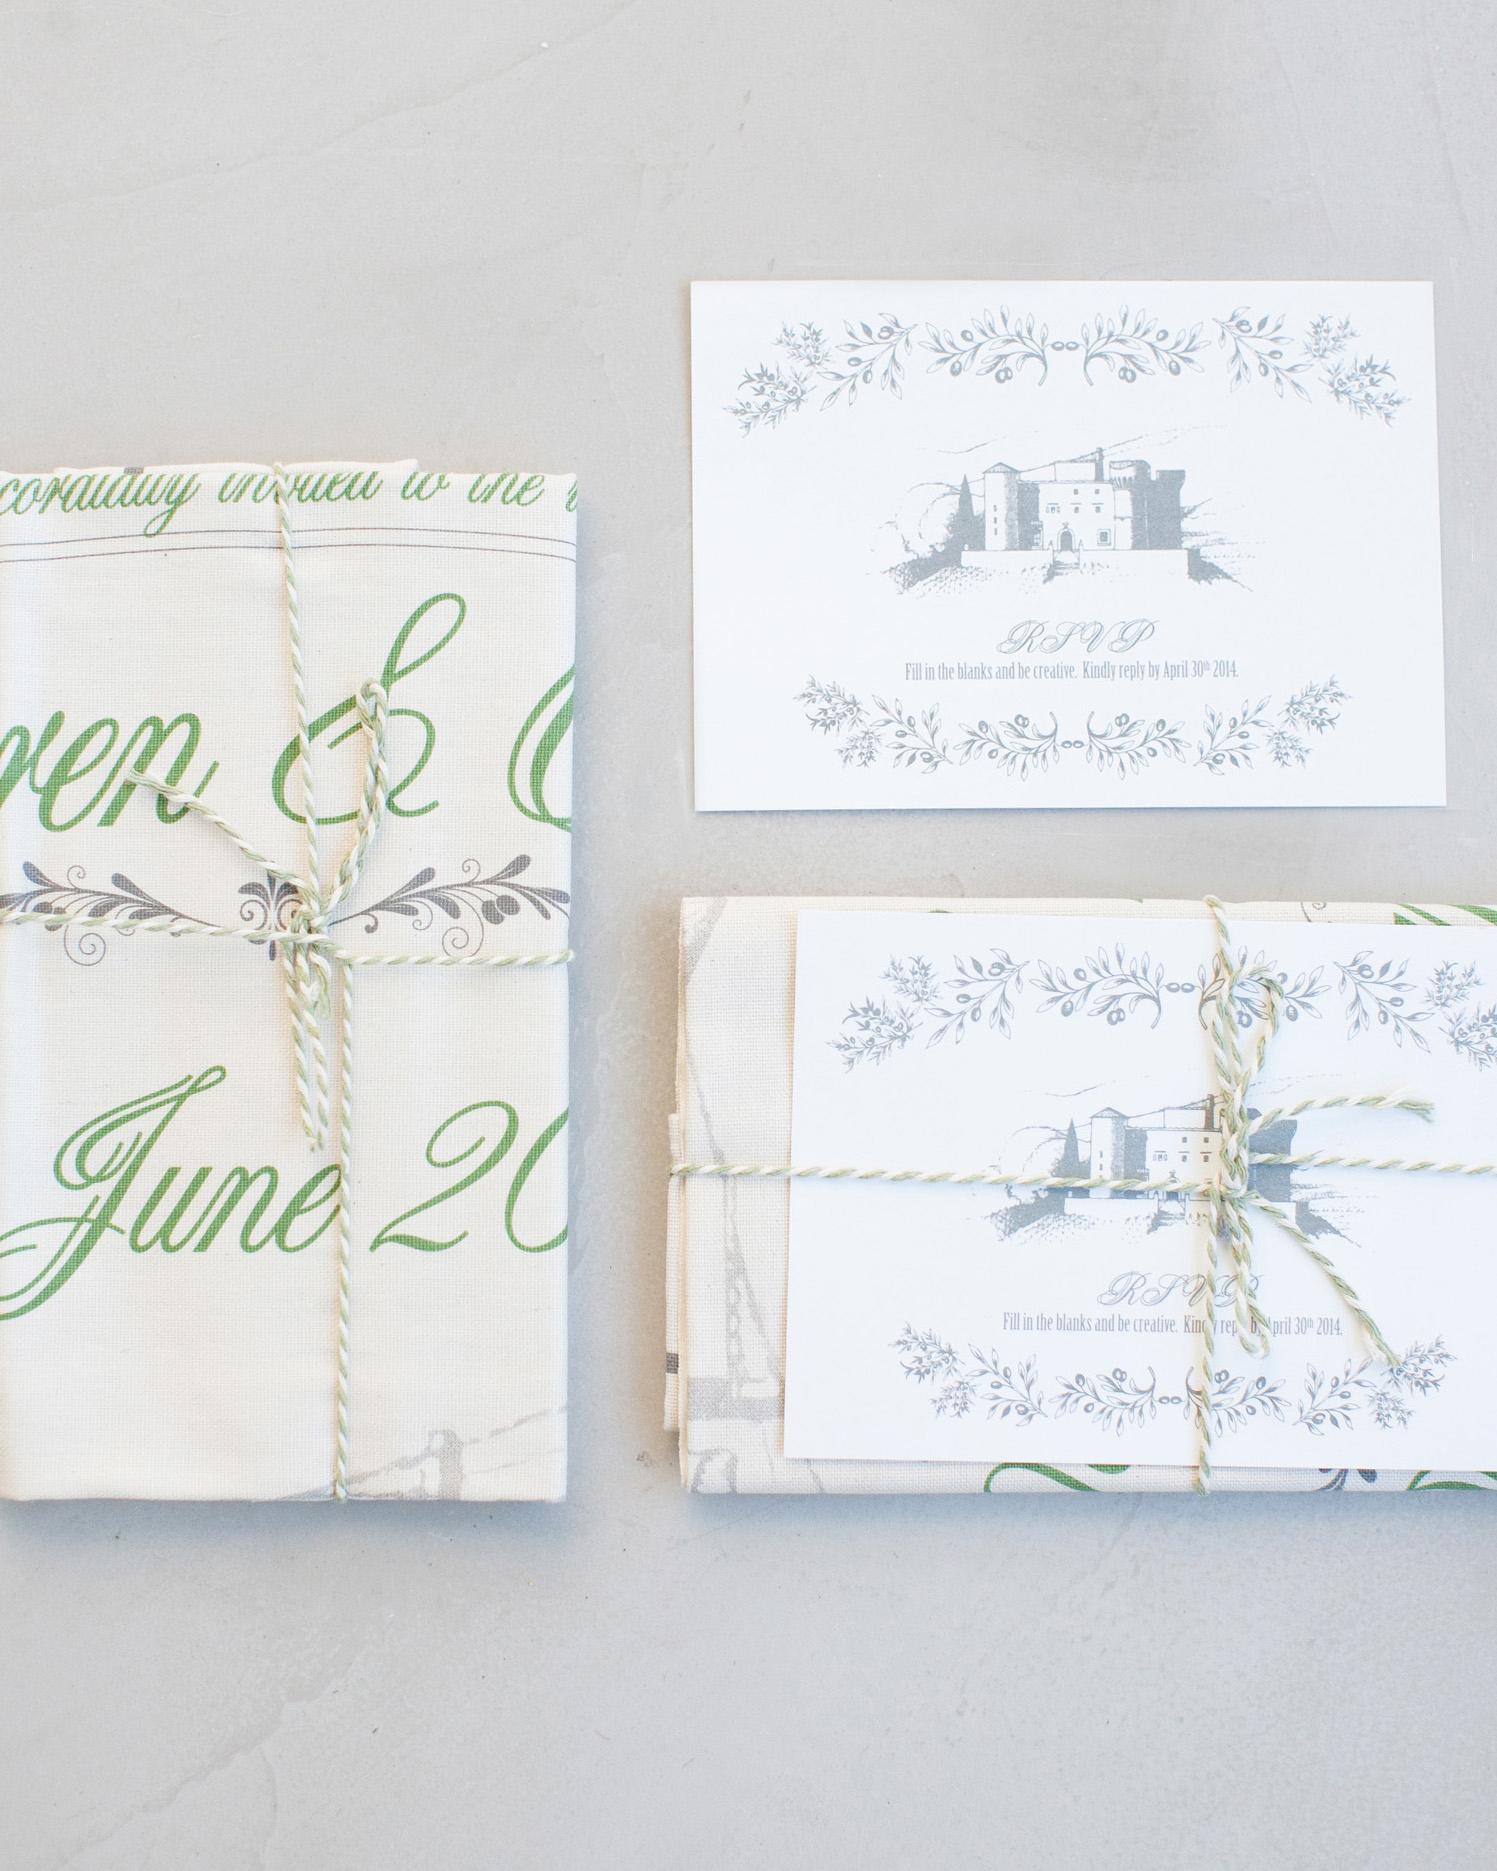 lauren-ollie-wedding-invitation-1-s111895-0515.jpg